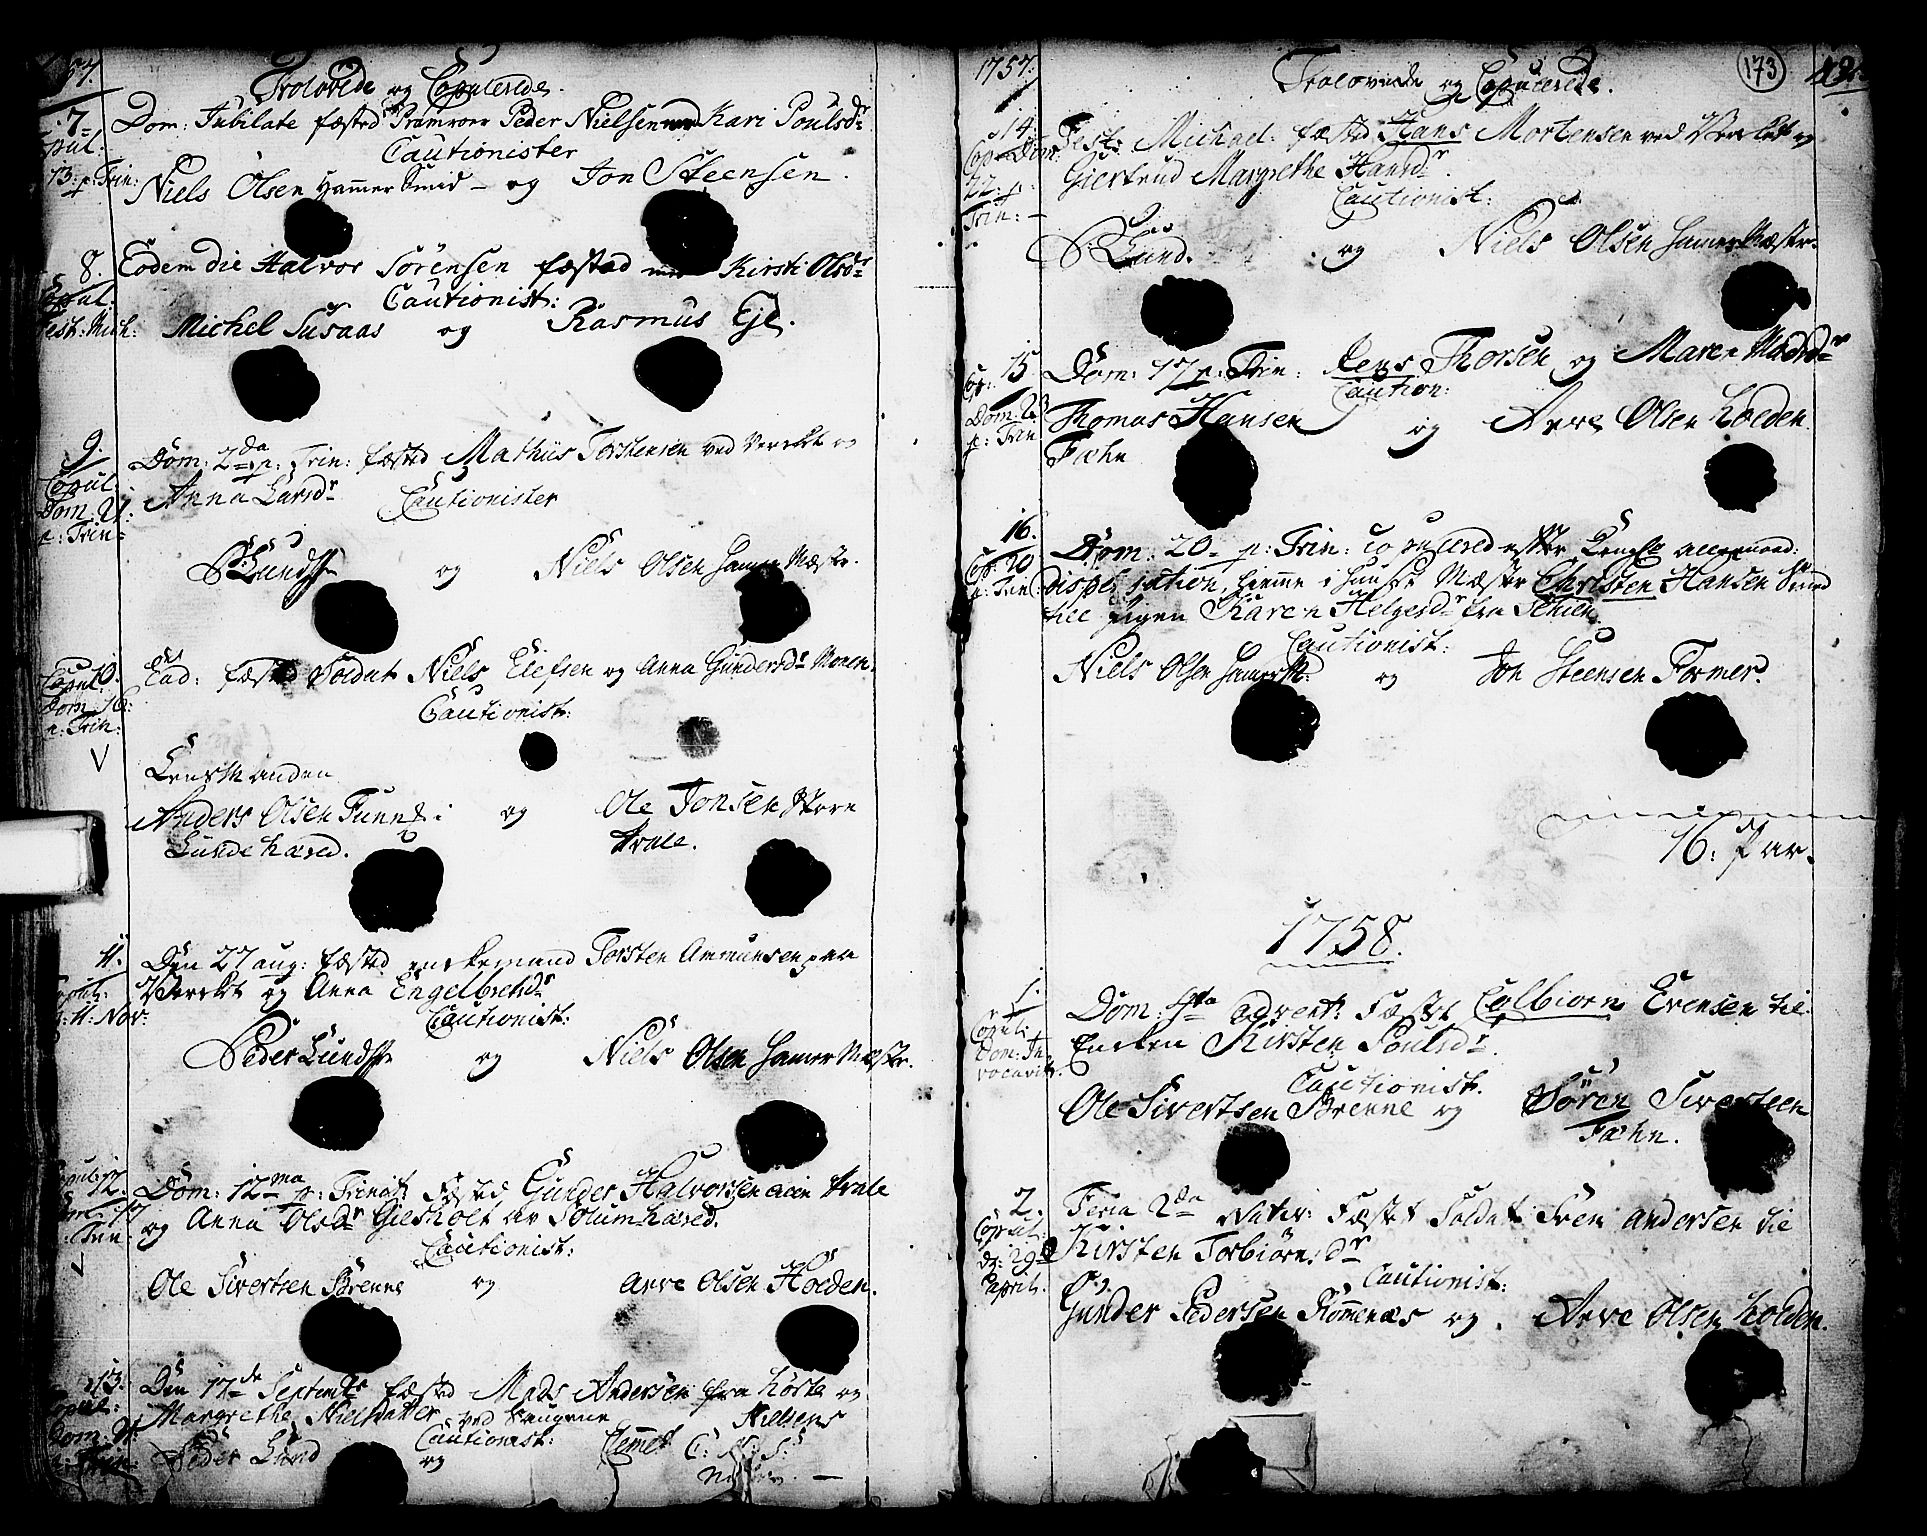 SAKO, Holla kirkebøker, F/Fa/L0001: Ministerialbok nr. 1, 1717-1779, s. 173